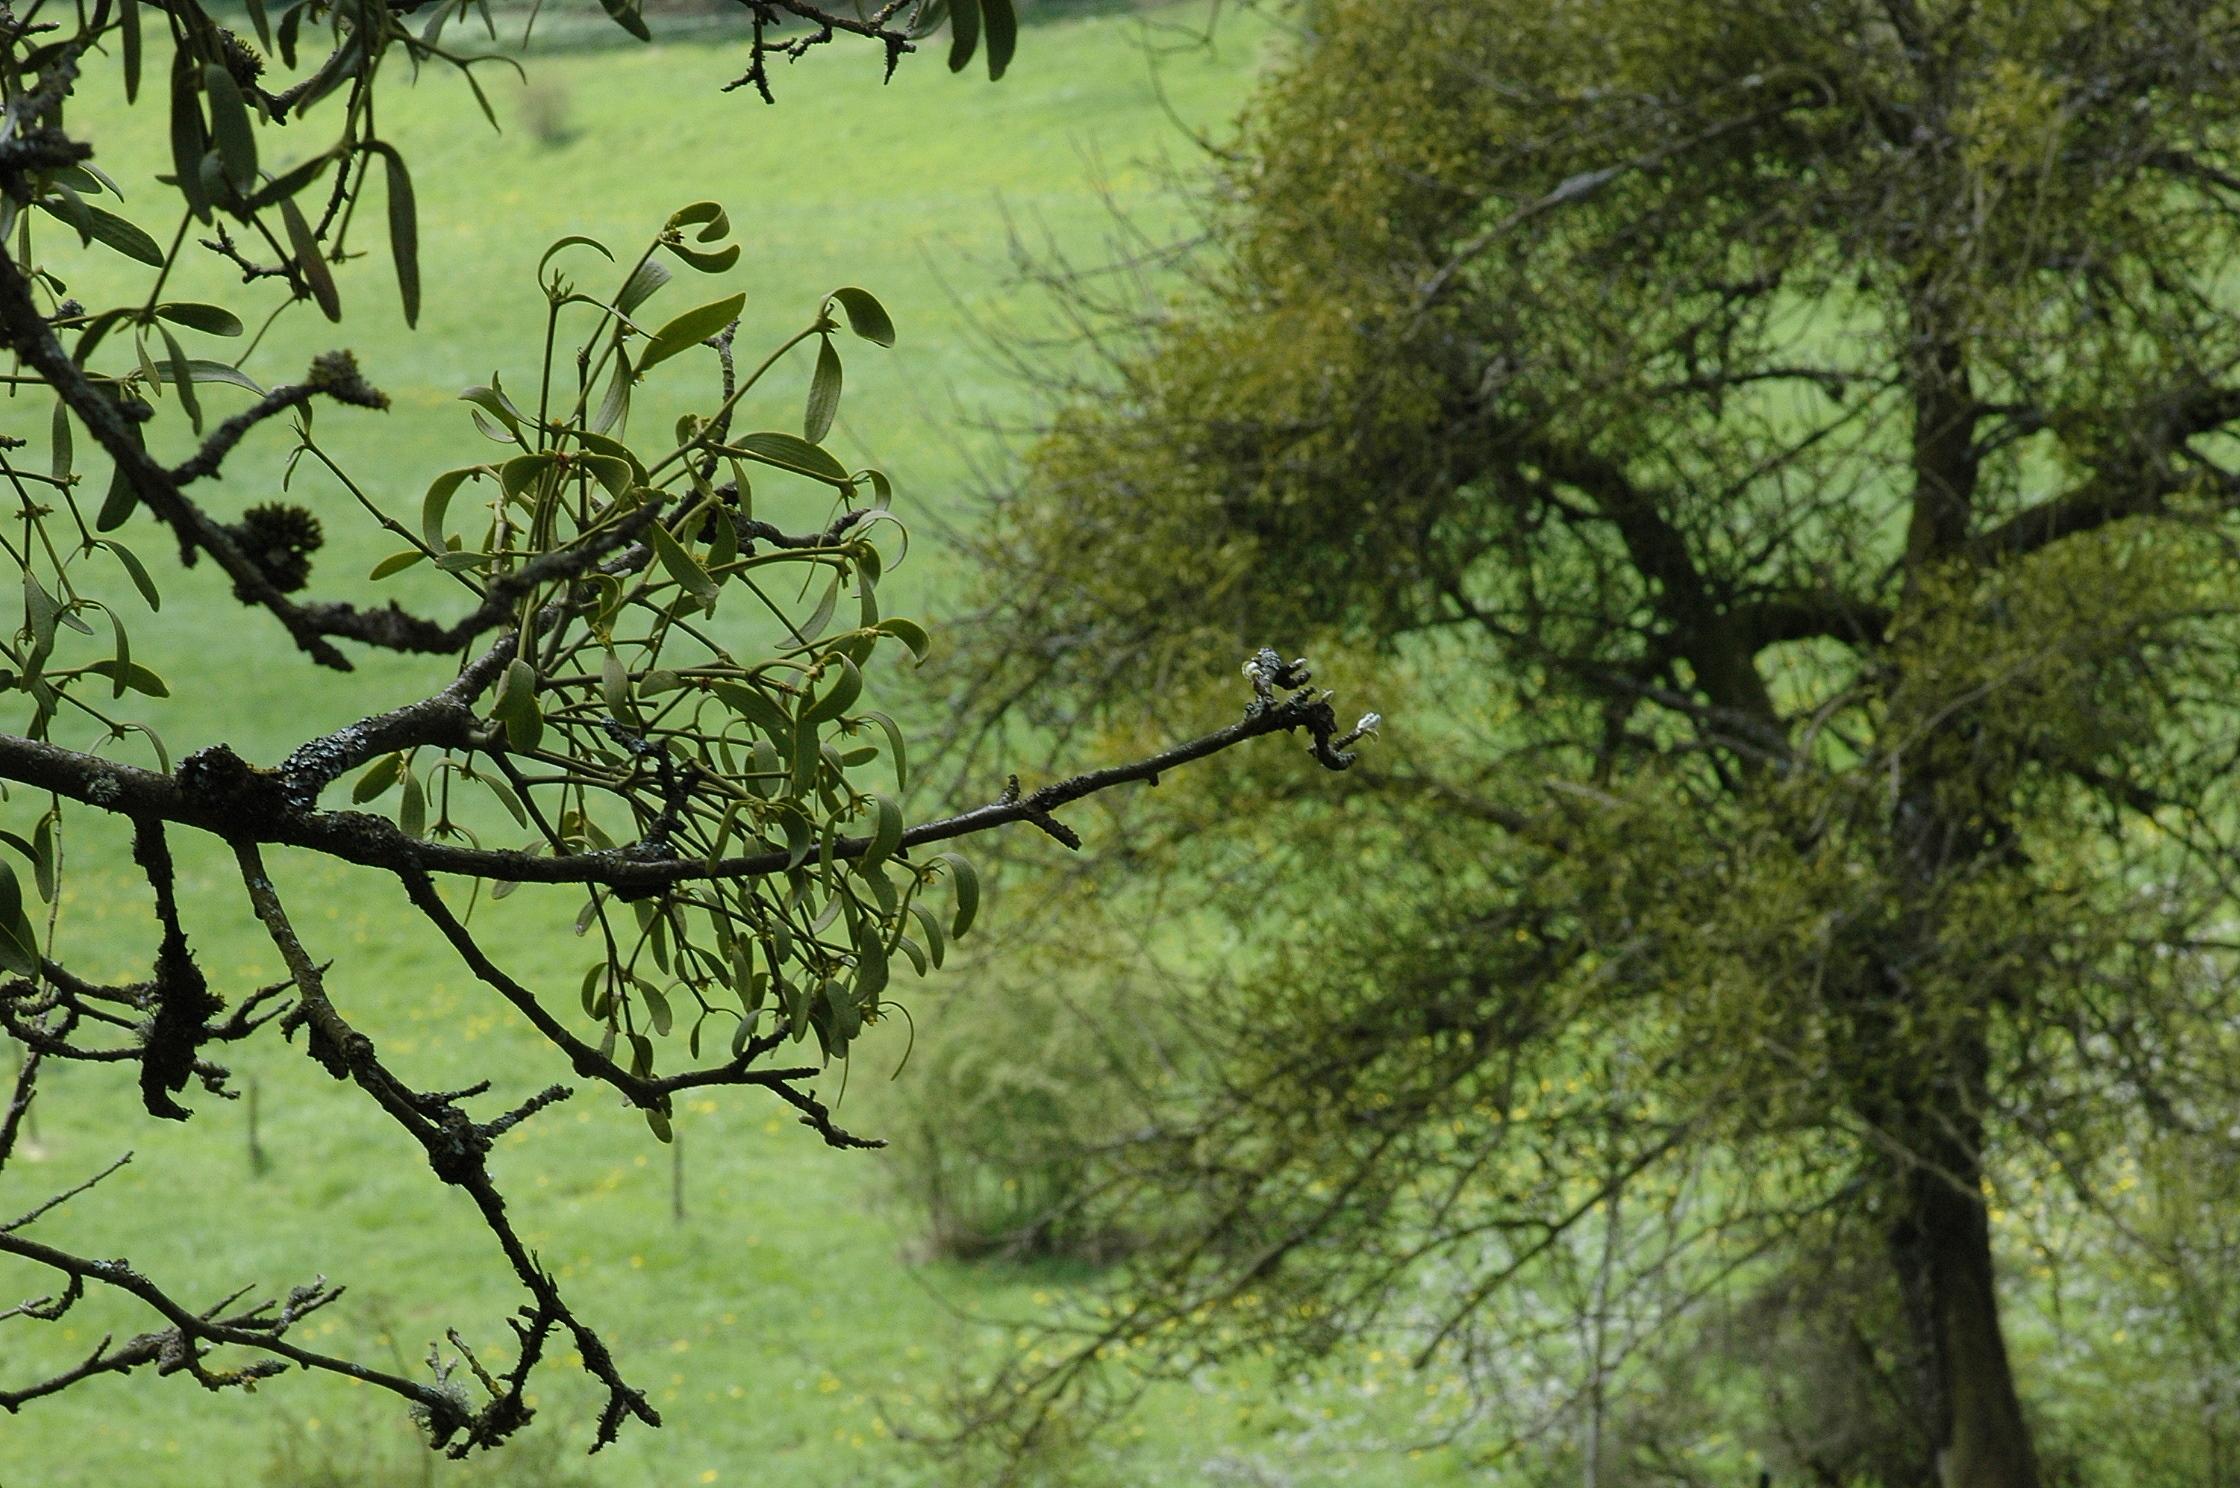 Image of European mistletoe